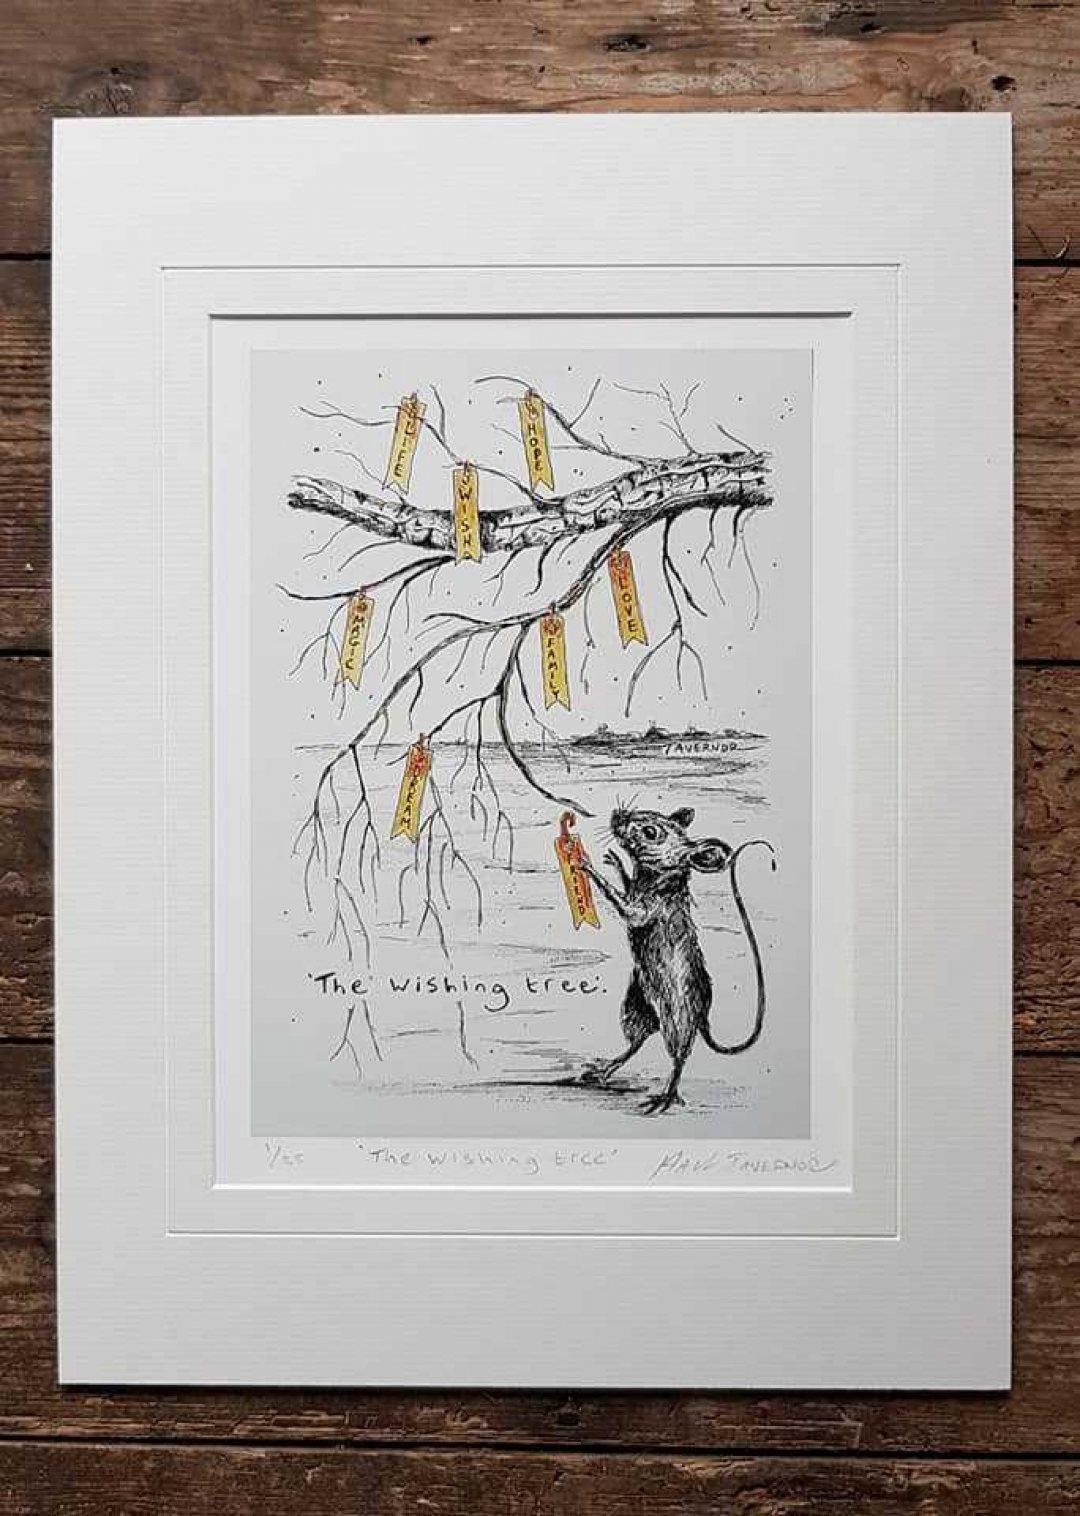 The wishing tree Paul Tavernor Art